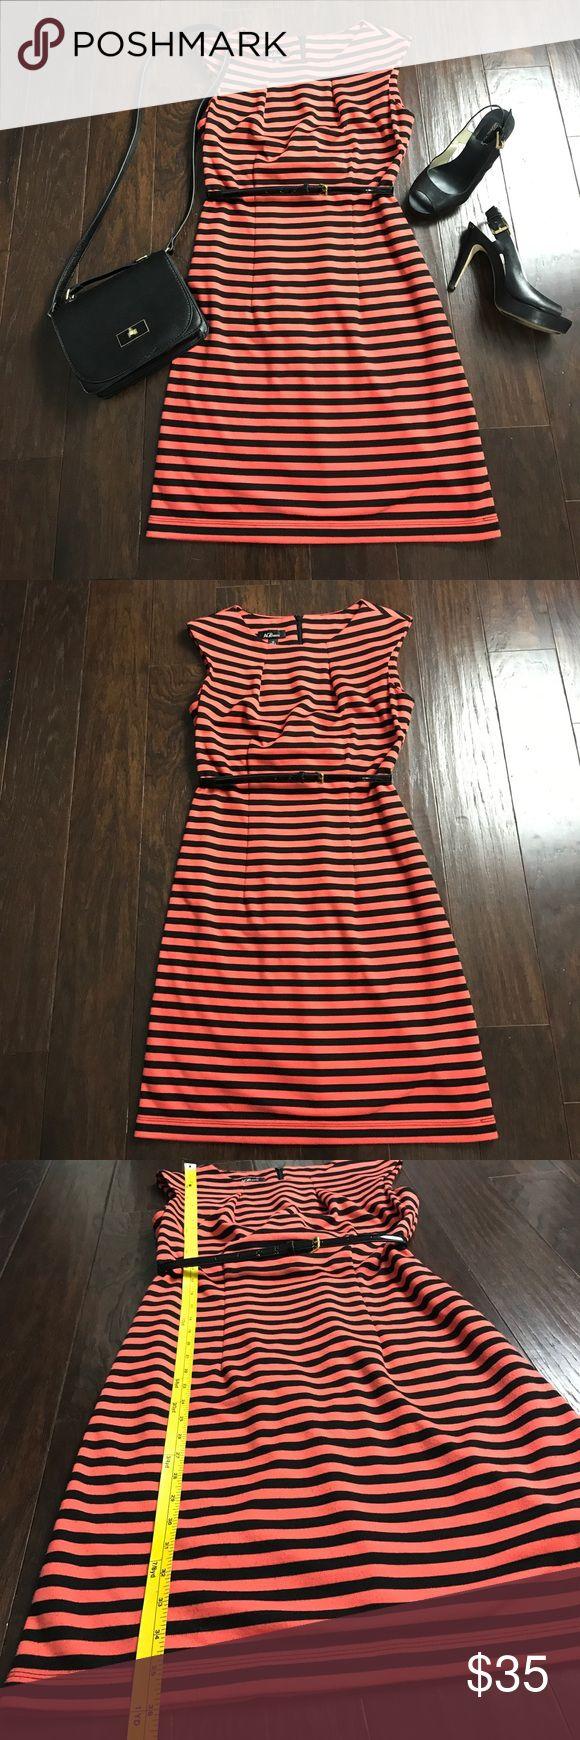 Orange & Black Sheath Dress Sheath dress striped in orange and black. Cotton stretch material. Belt included. Dresses Midi